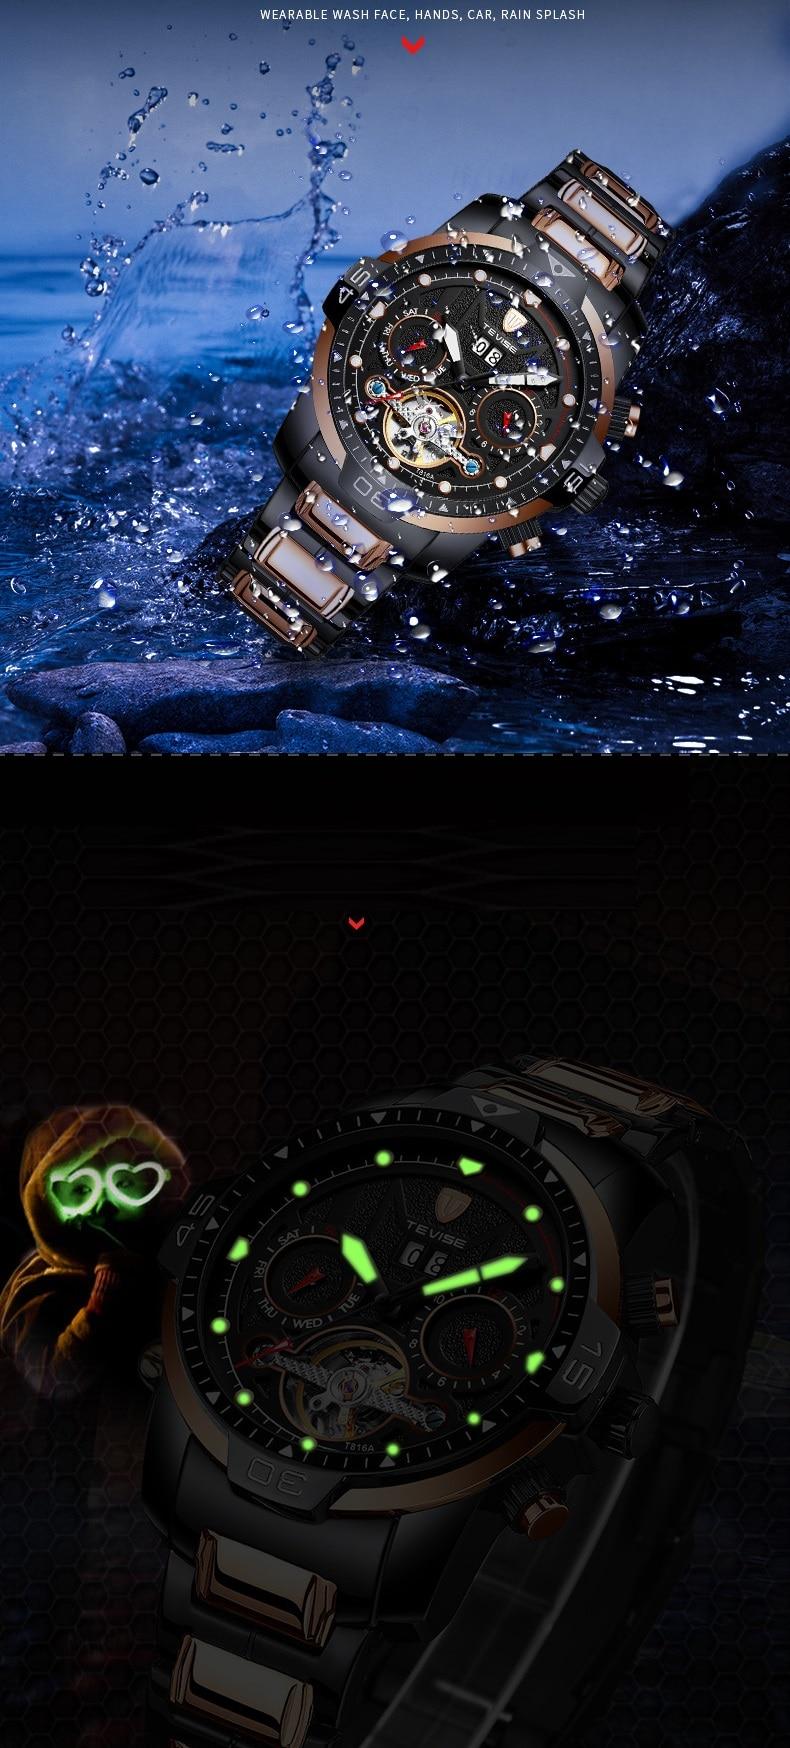 Big Man Watch TEVISE T816A Tourbillon Week Date Month Automatic Mechanical Wristwatch Luminous Hand Scale Watch Men Dropshipping (7)